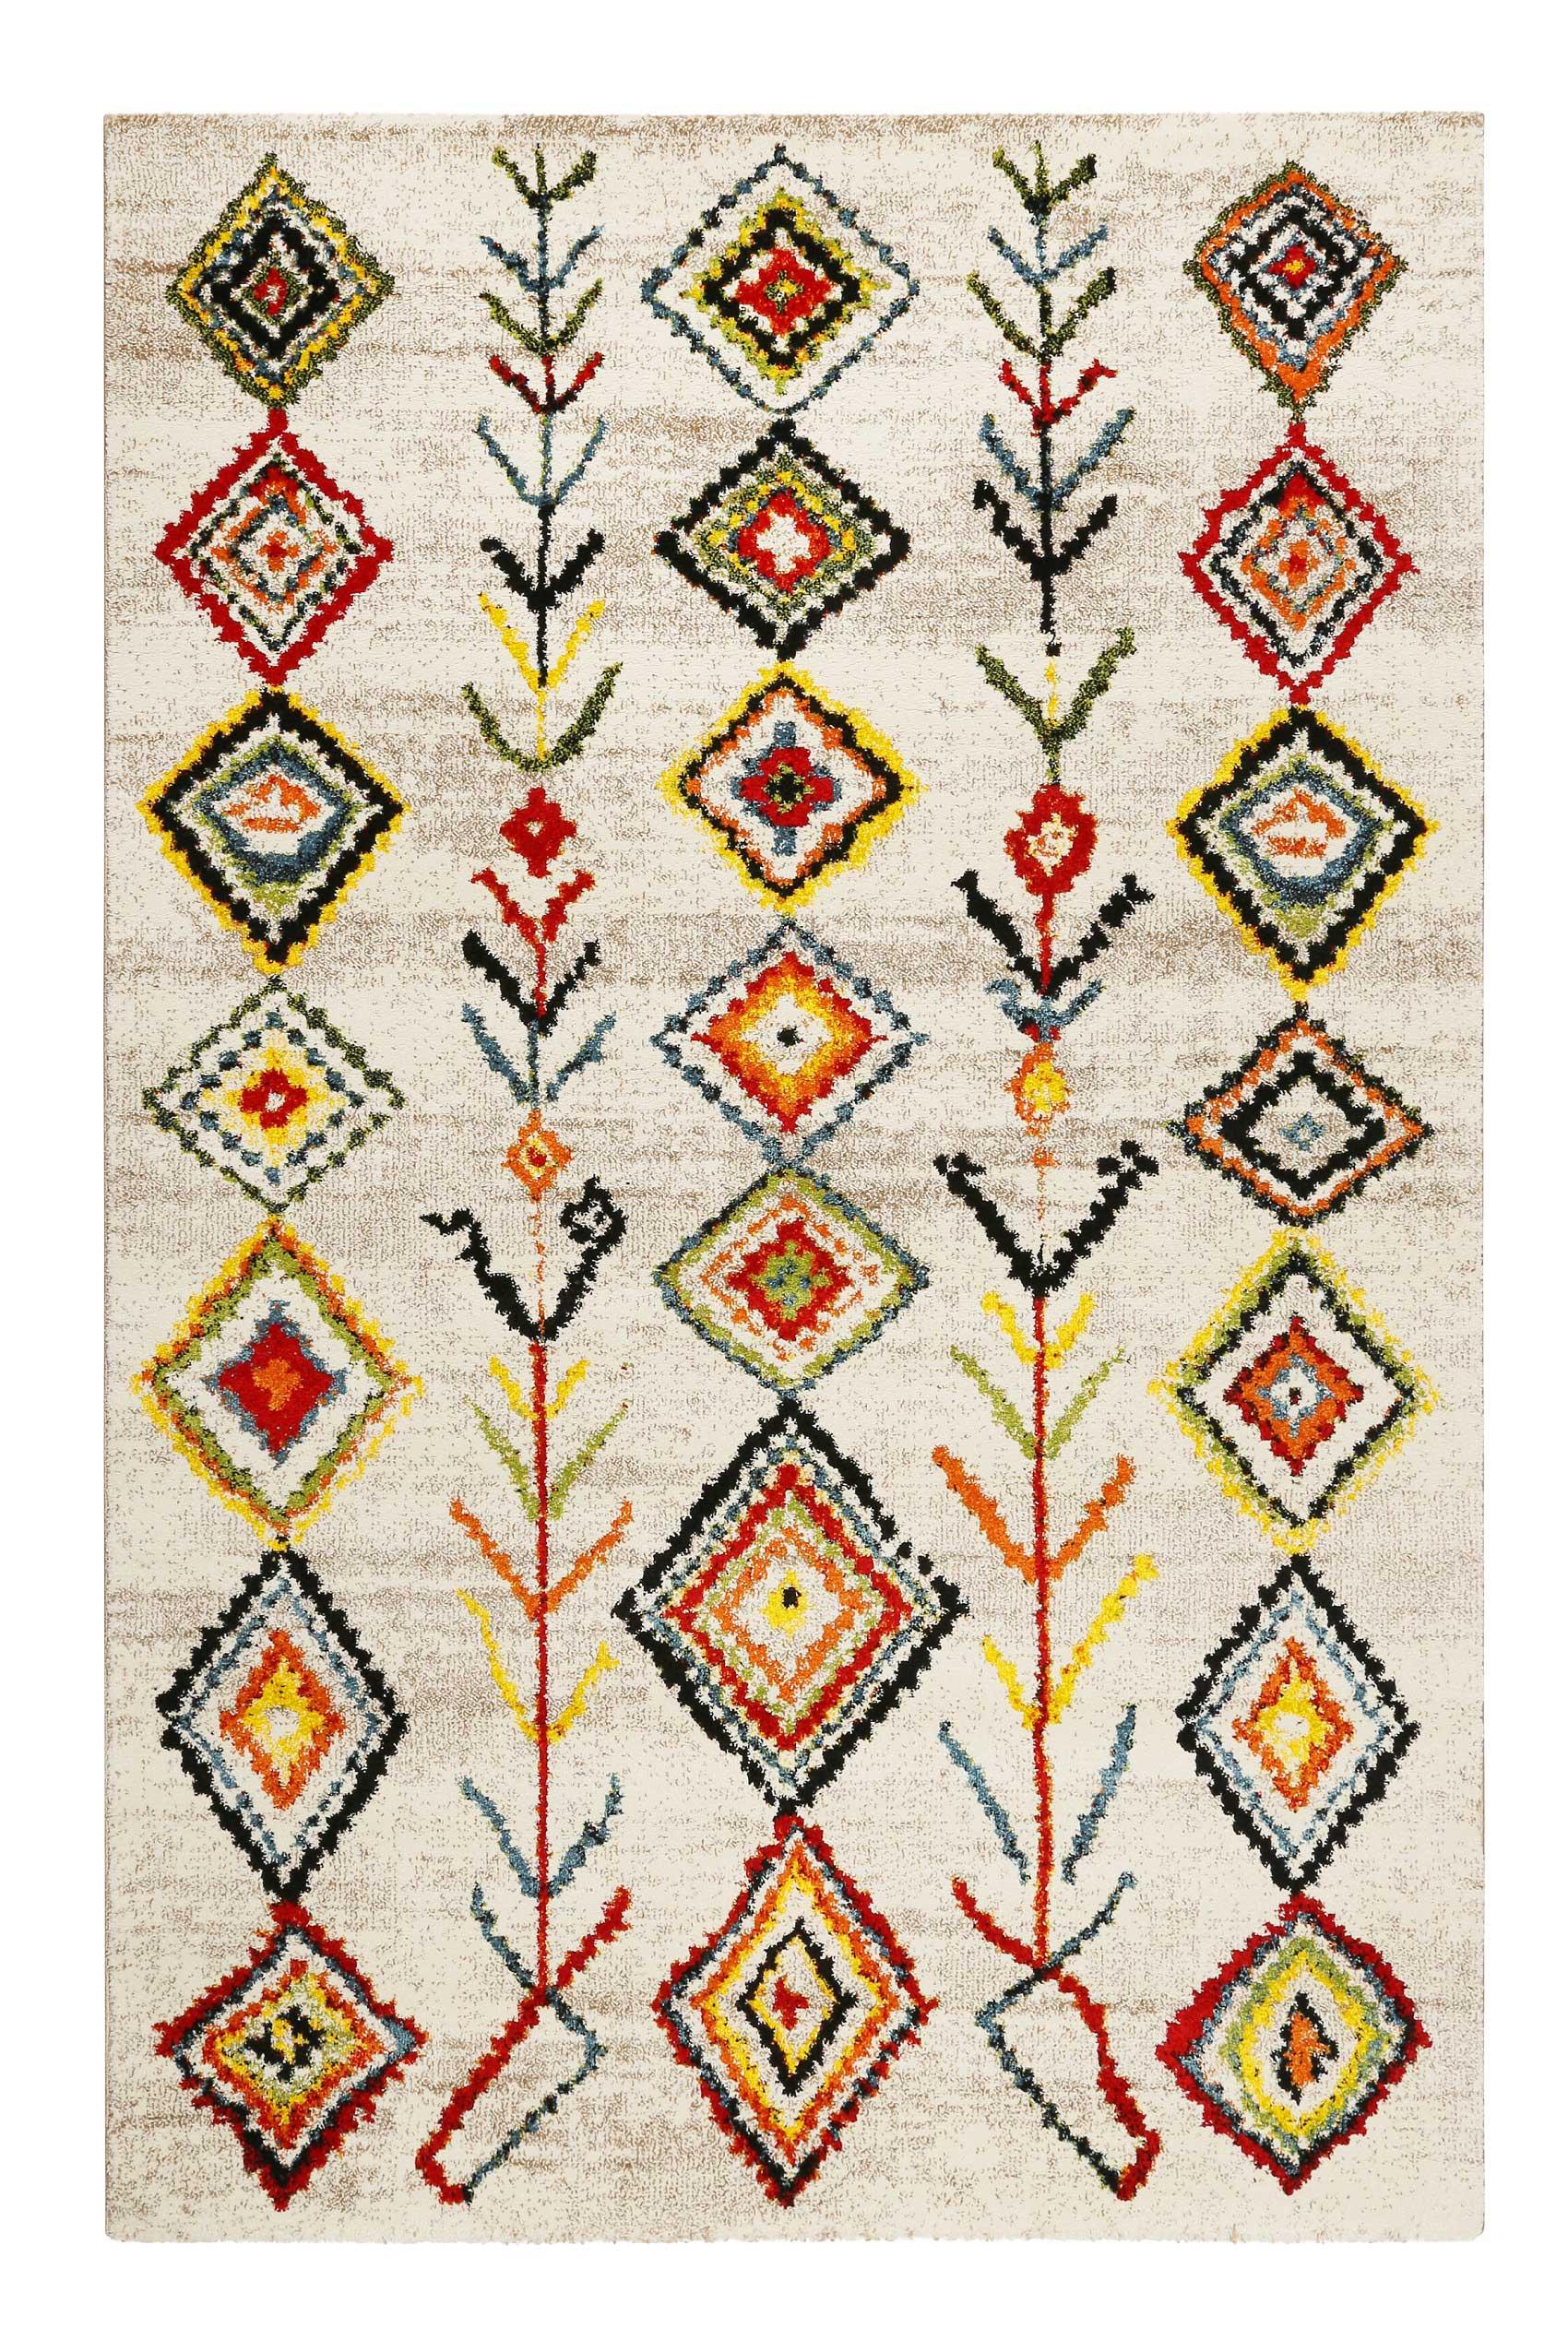 Tapis inspiration berbère multicolore pour salon, chambre 290x200